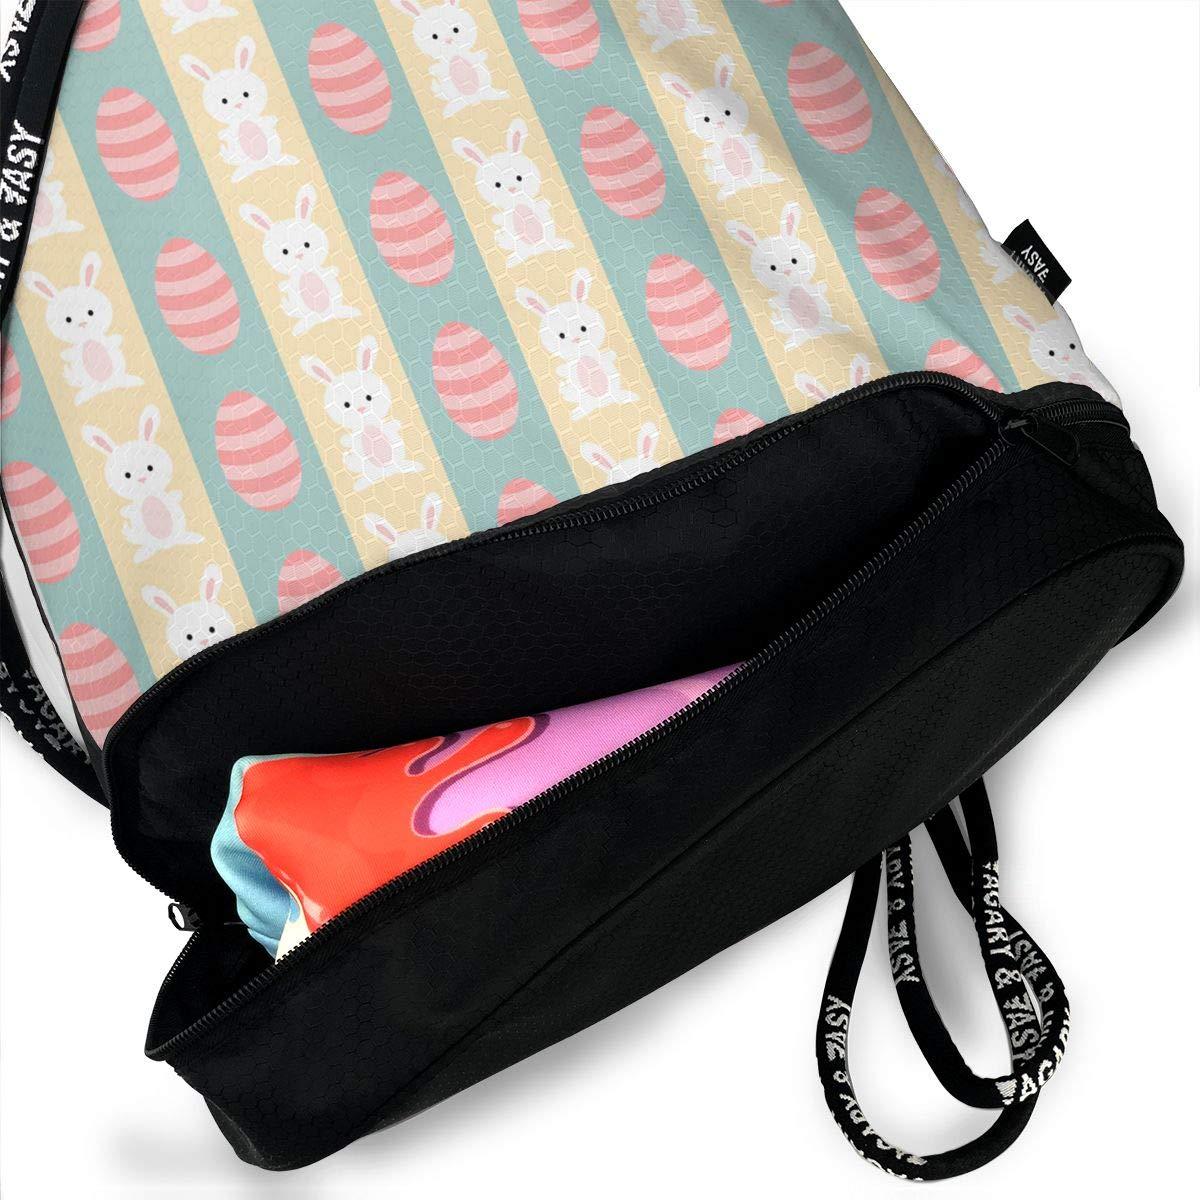 Zol1Q Lightweight Waterproof Large Storage Drawstring Bag for Men /& Women Easter Cinch Backpack Sackpack Tote Sack